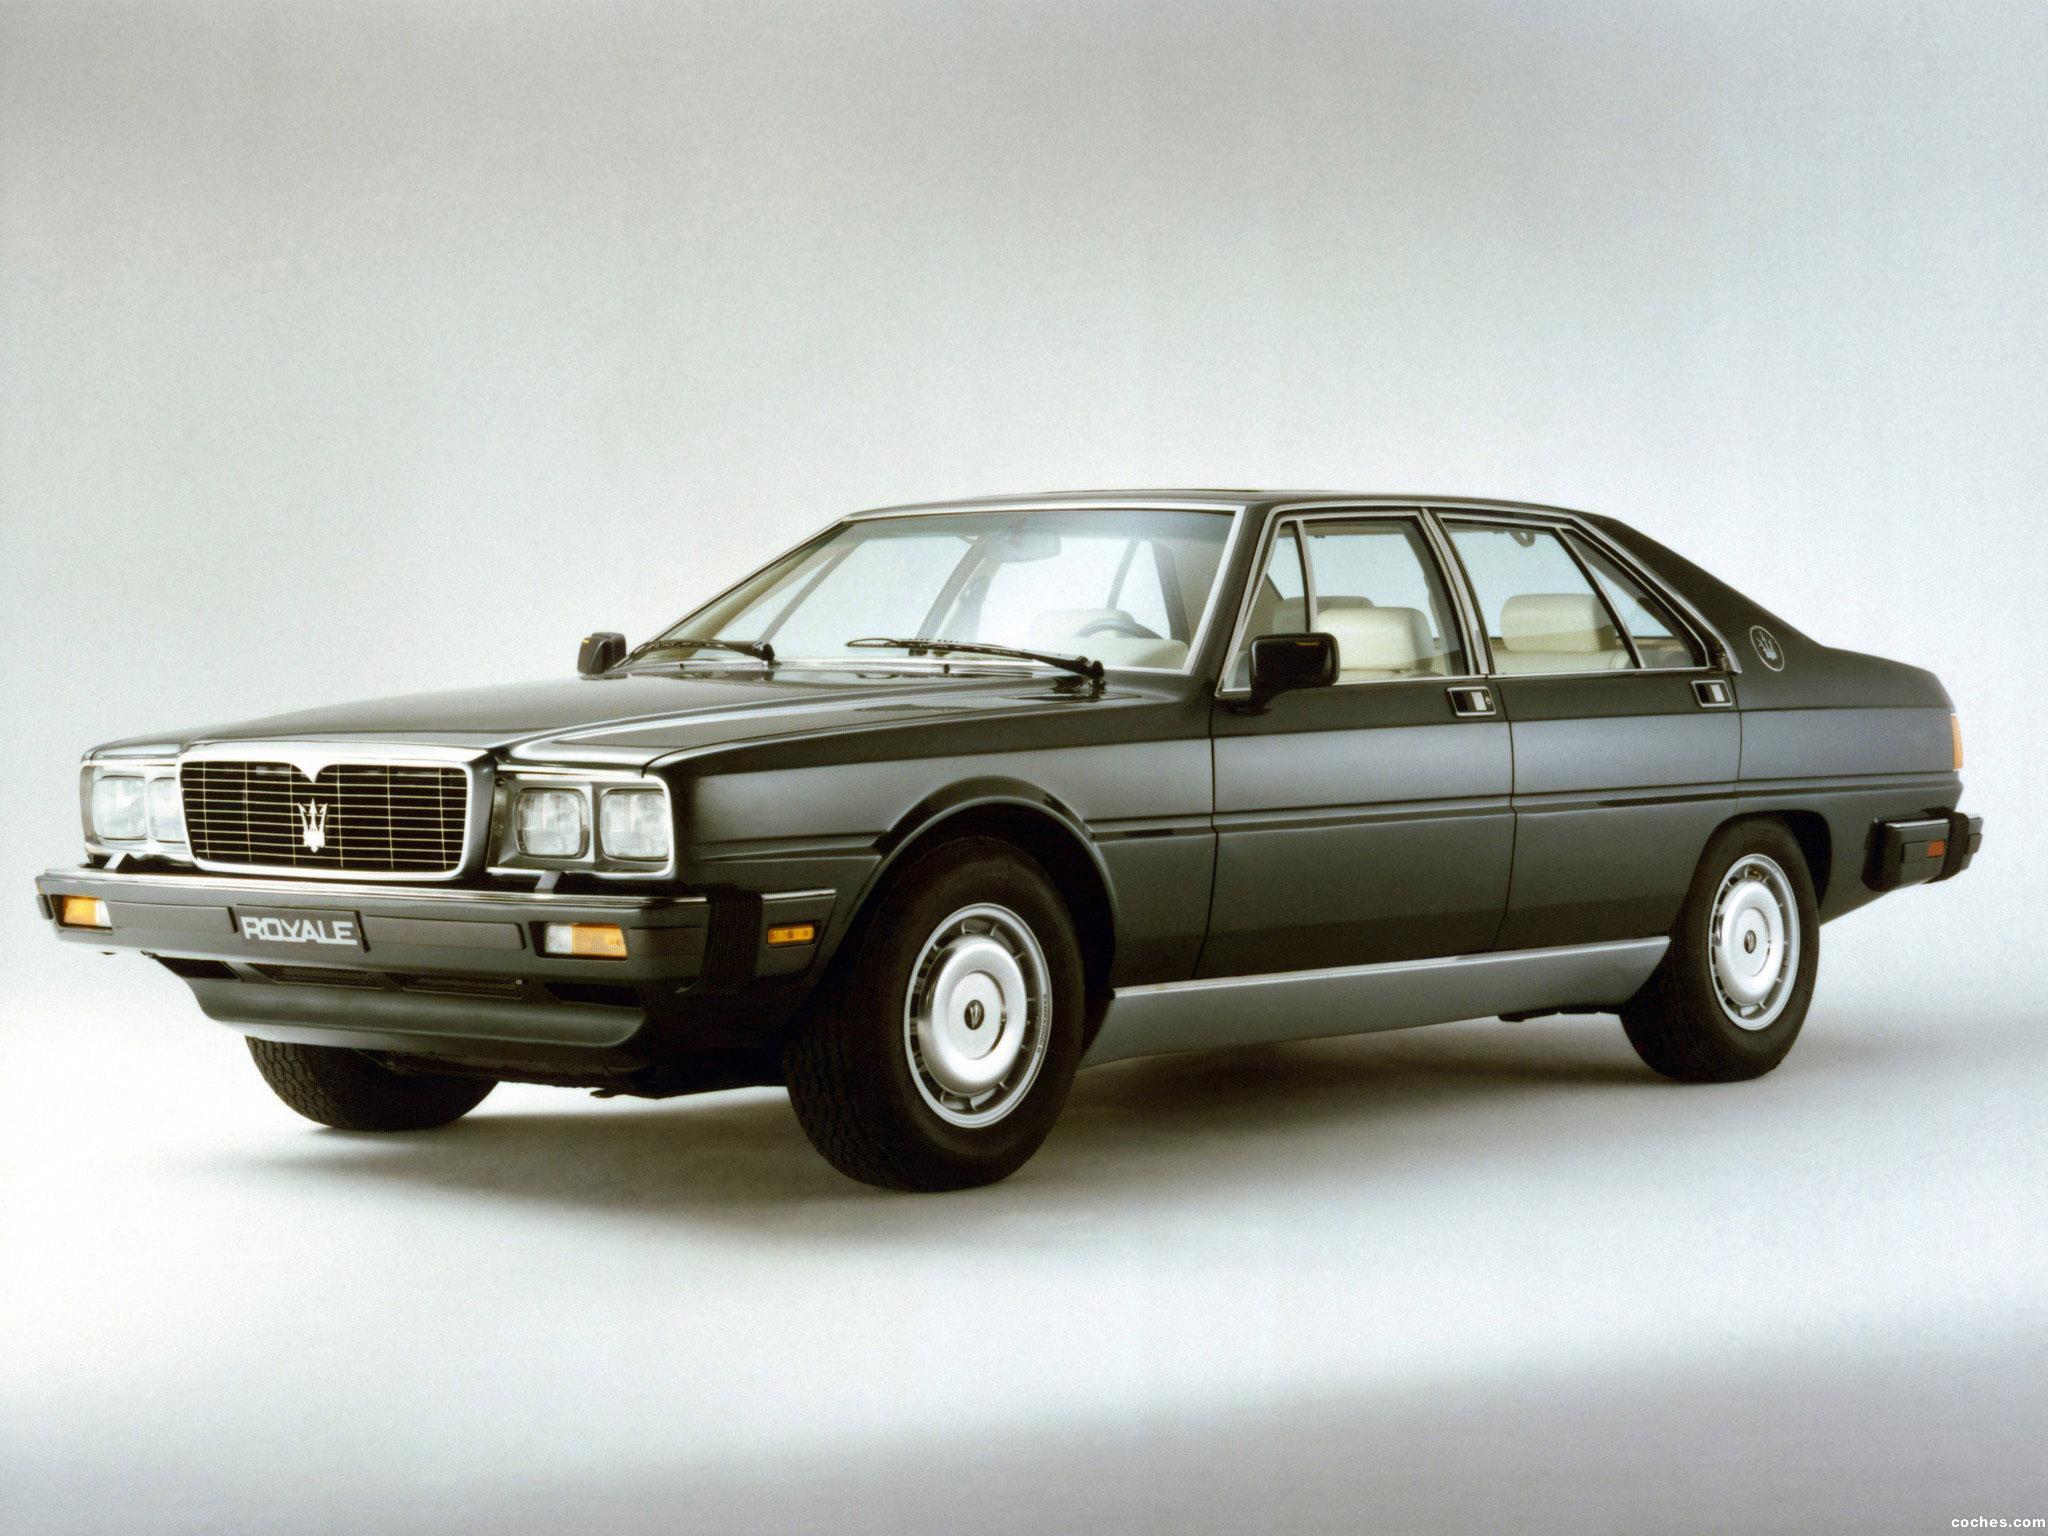 Foto 0 de Maserati Royale 1986-1990